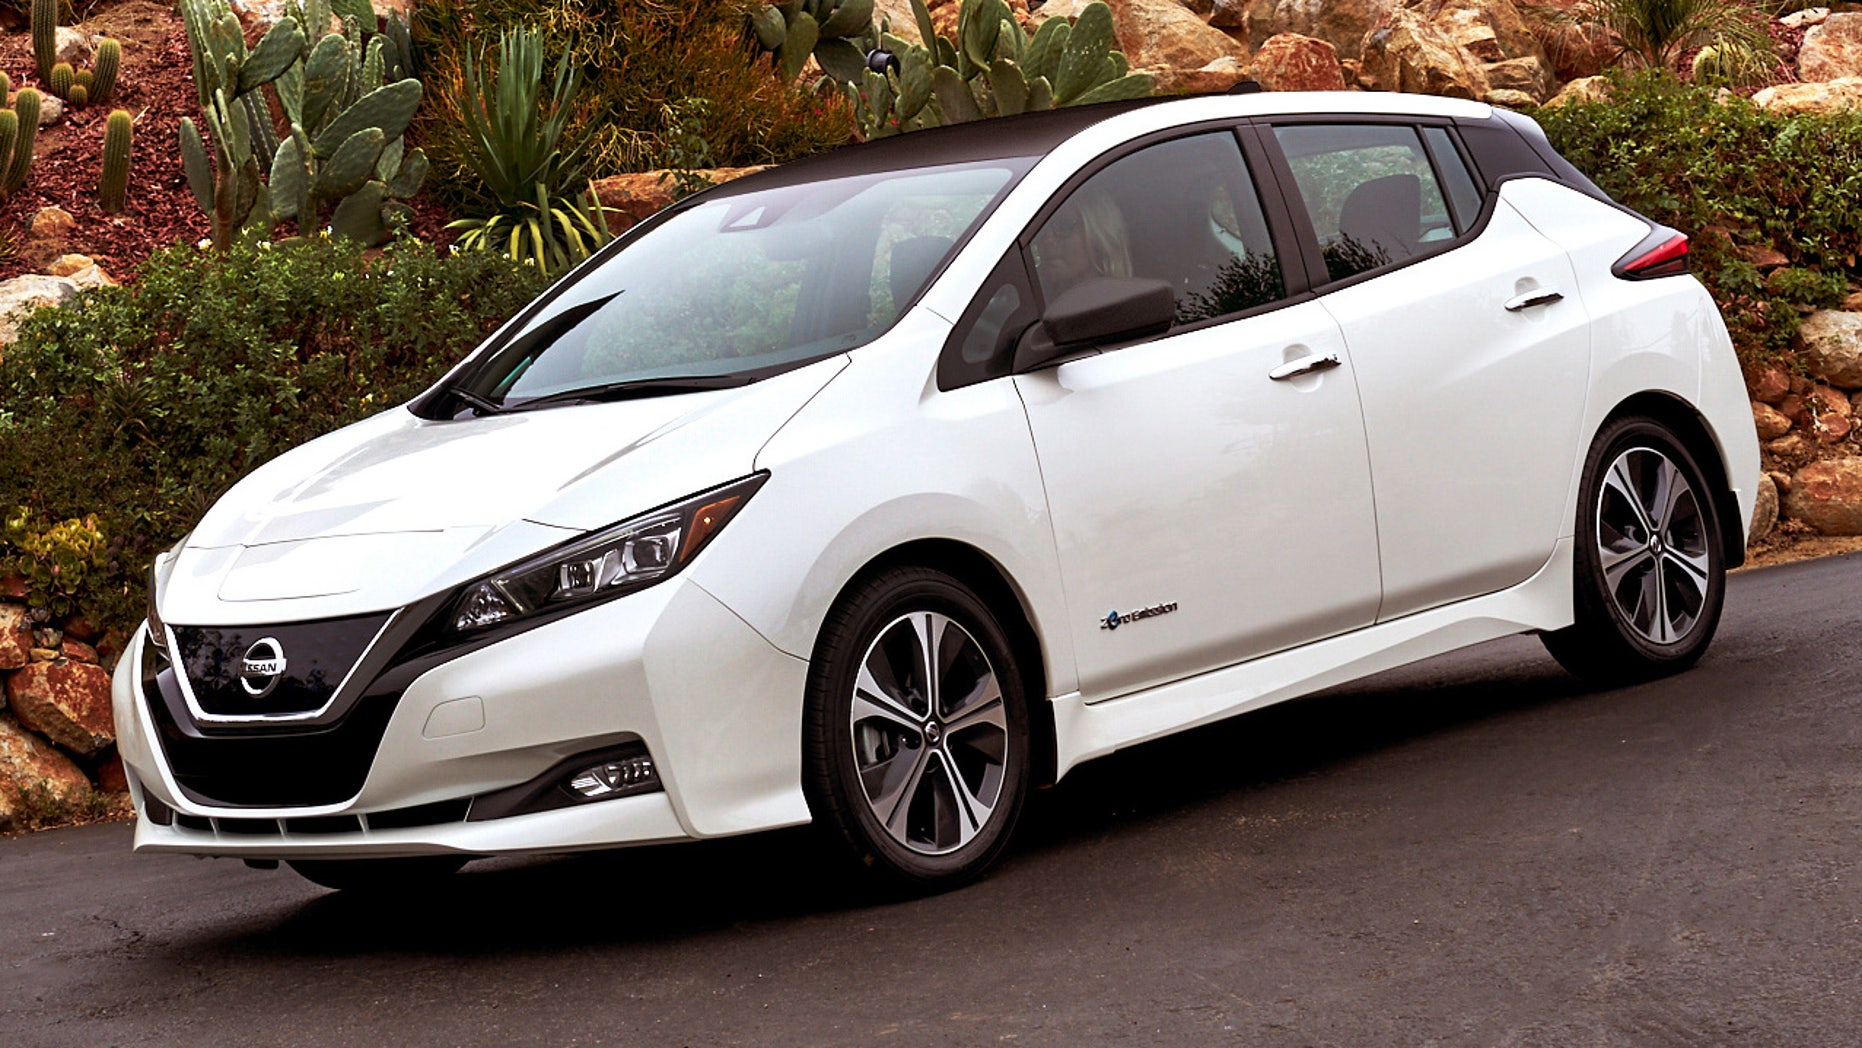 2018 Nissan Leaf Revealed With Longer Range Lower Price Fox News